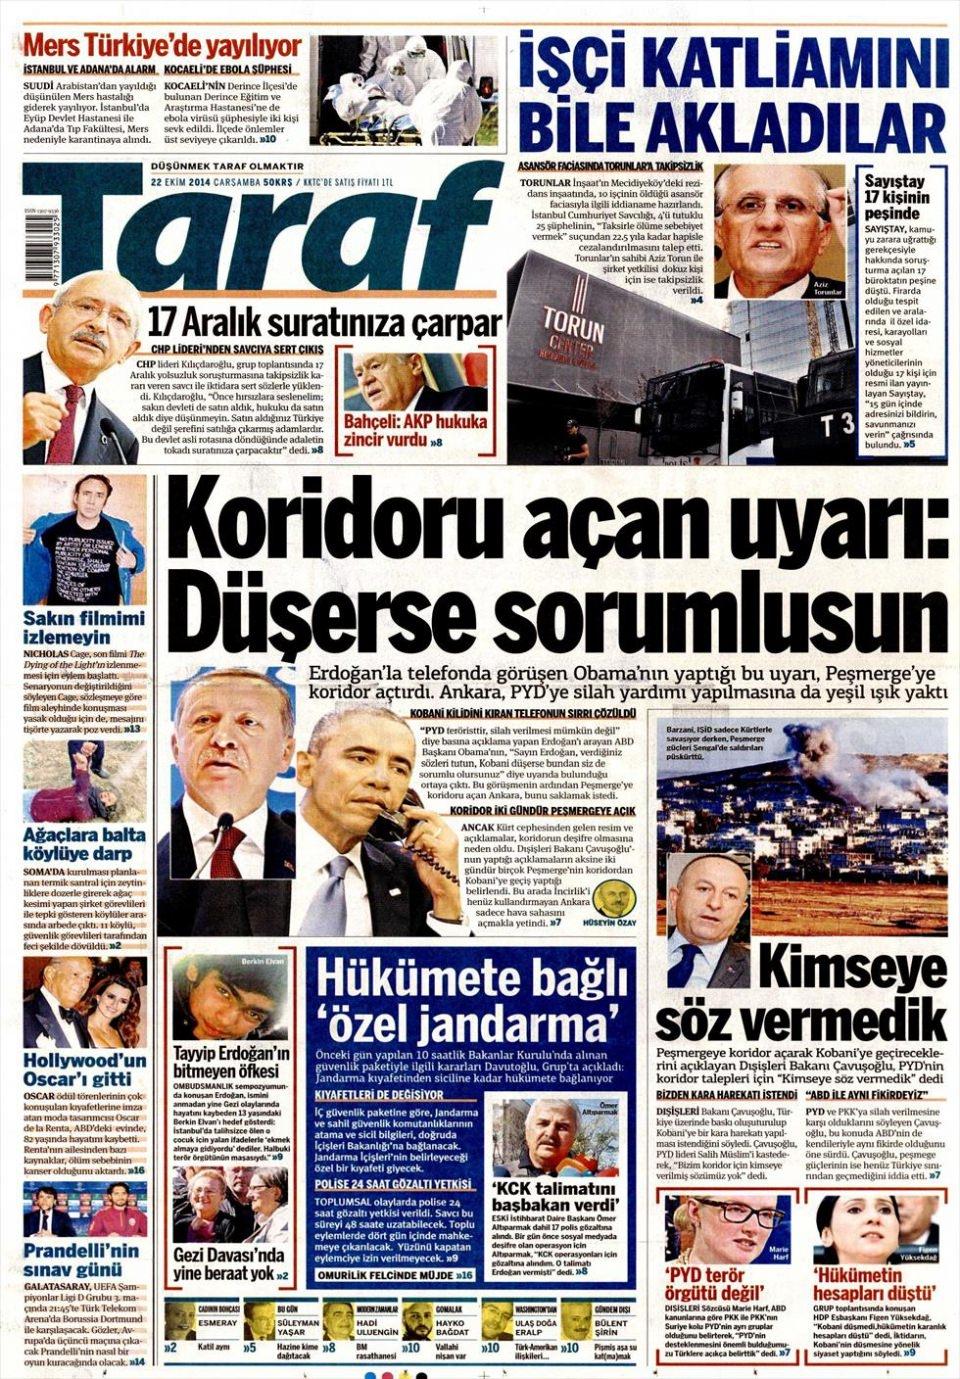 22 Ekim 2014 gazete manşetleri 19